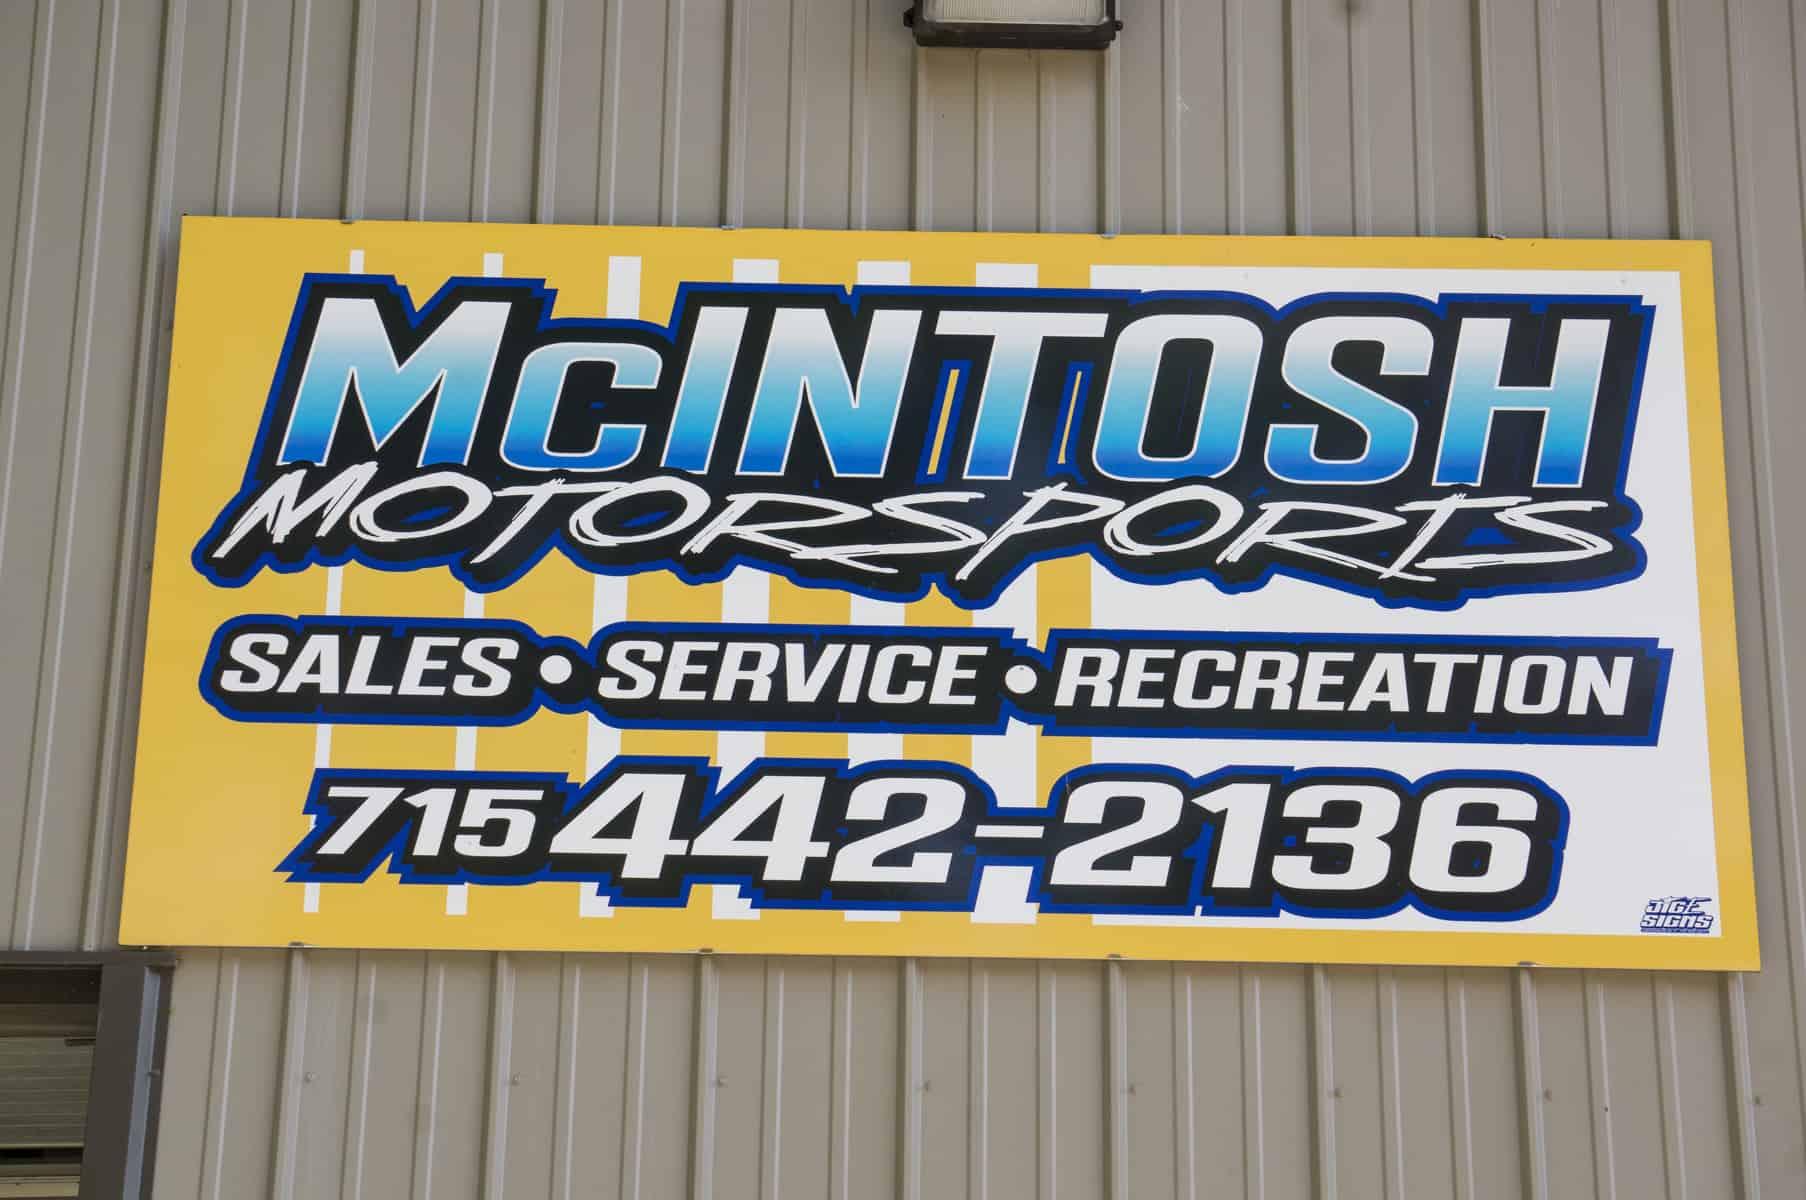 McIntosh Motor Sports